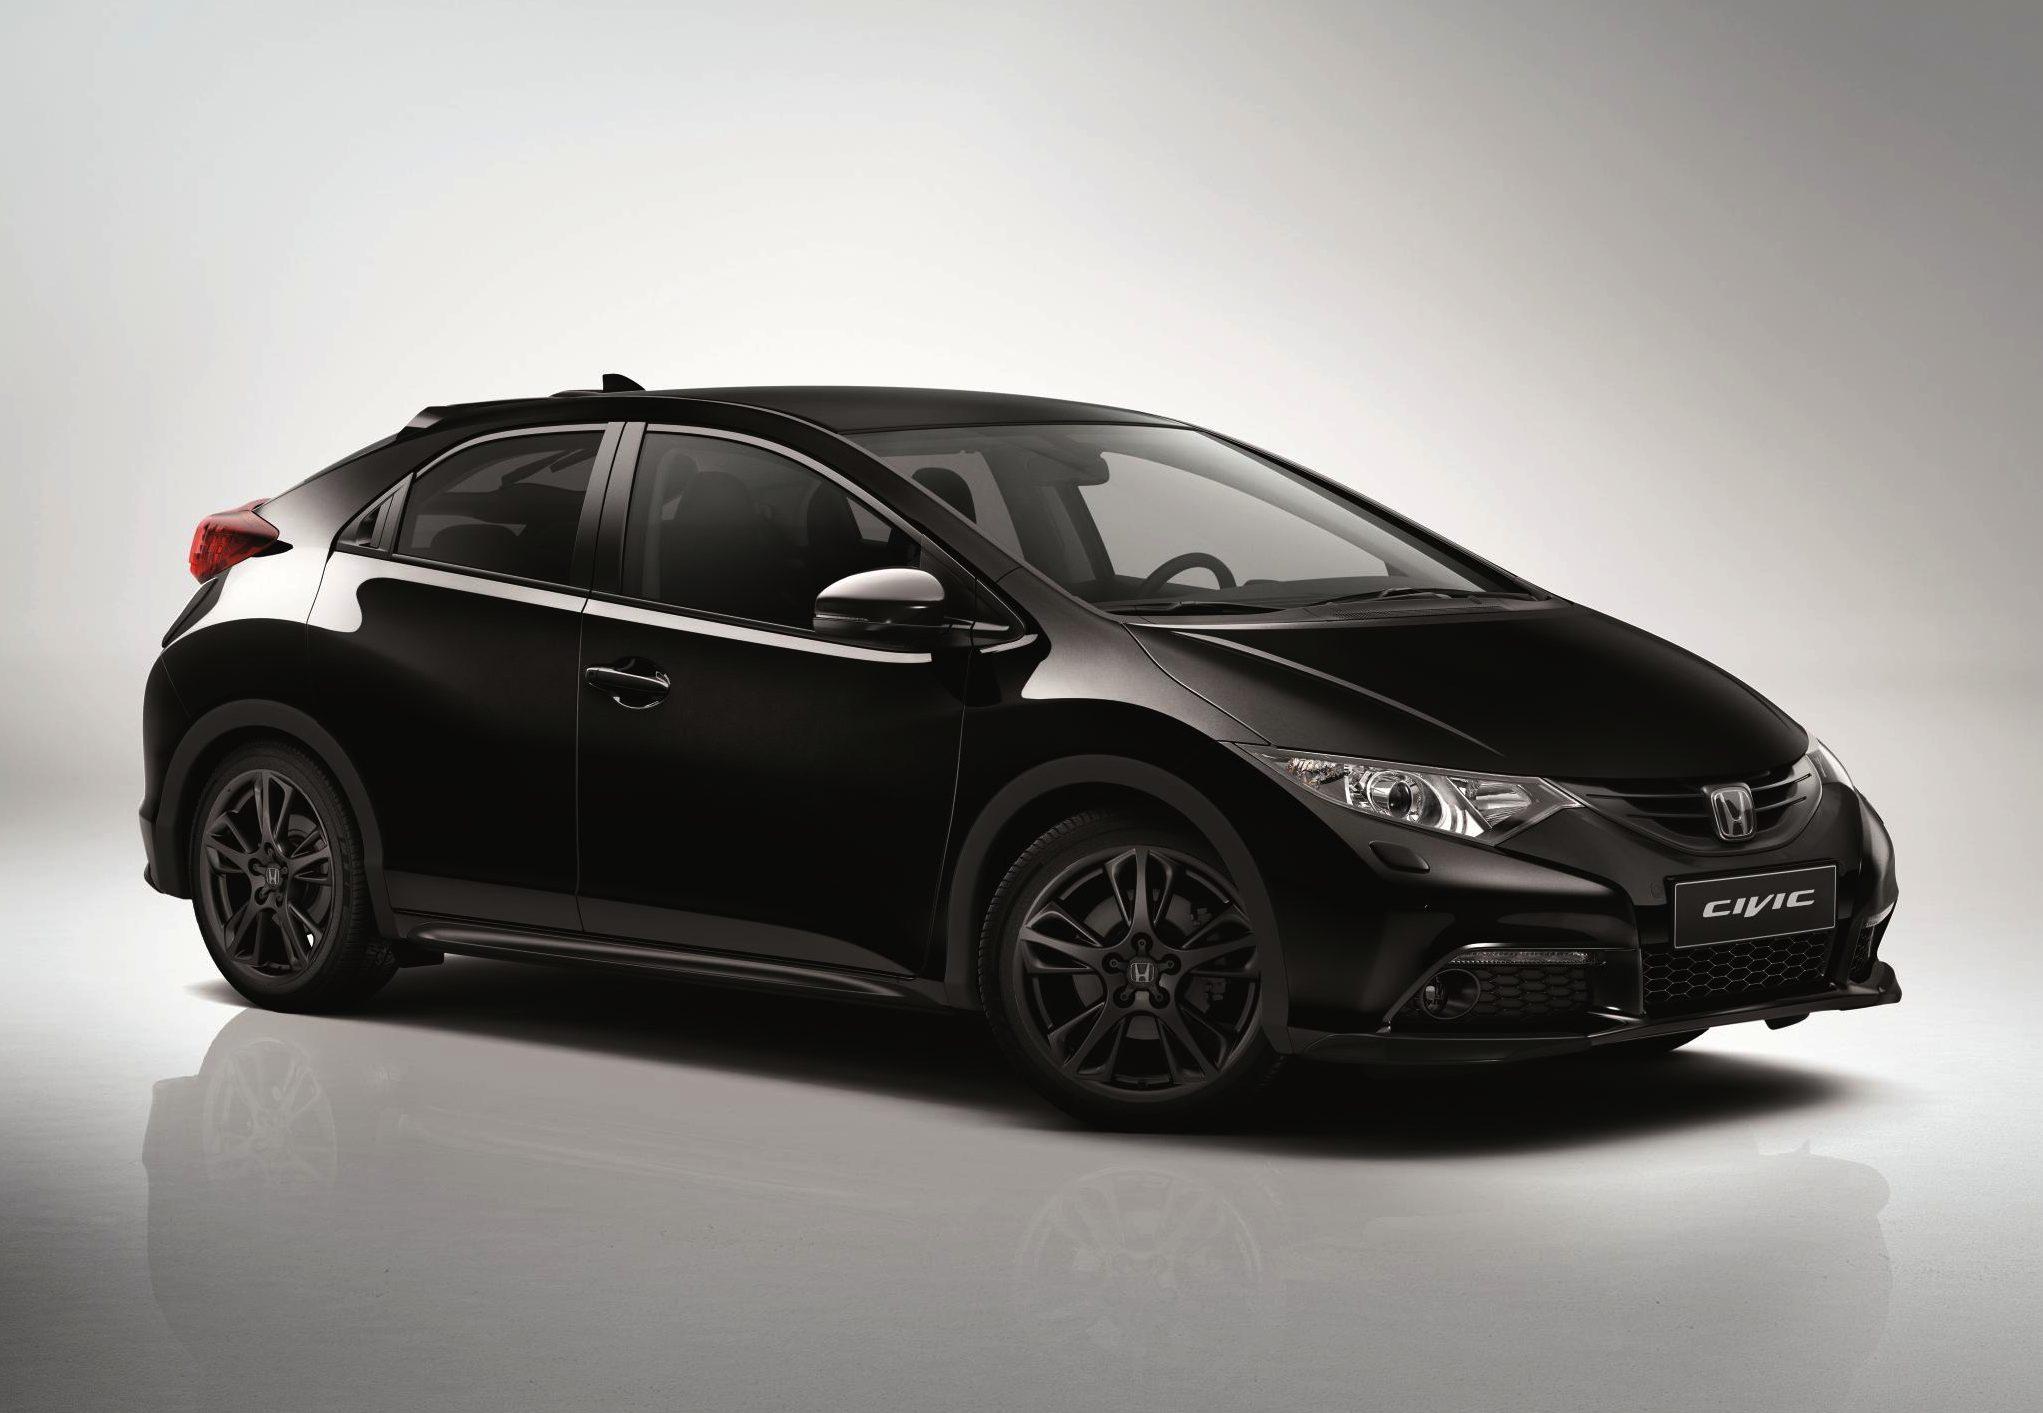 Honda Civic Black Edition 2014 01